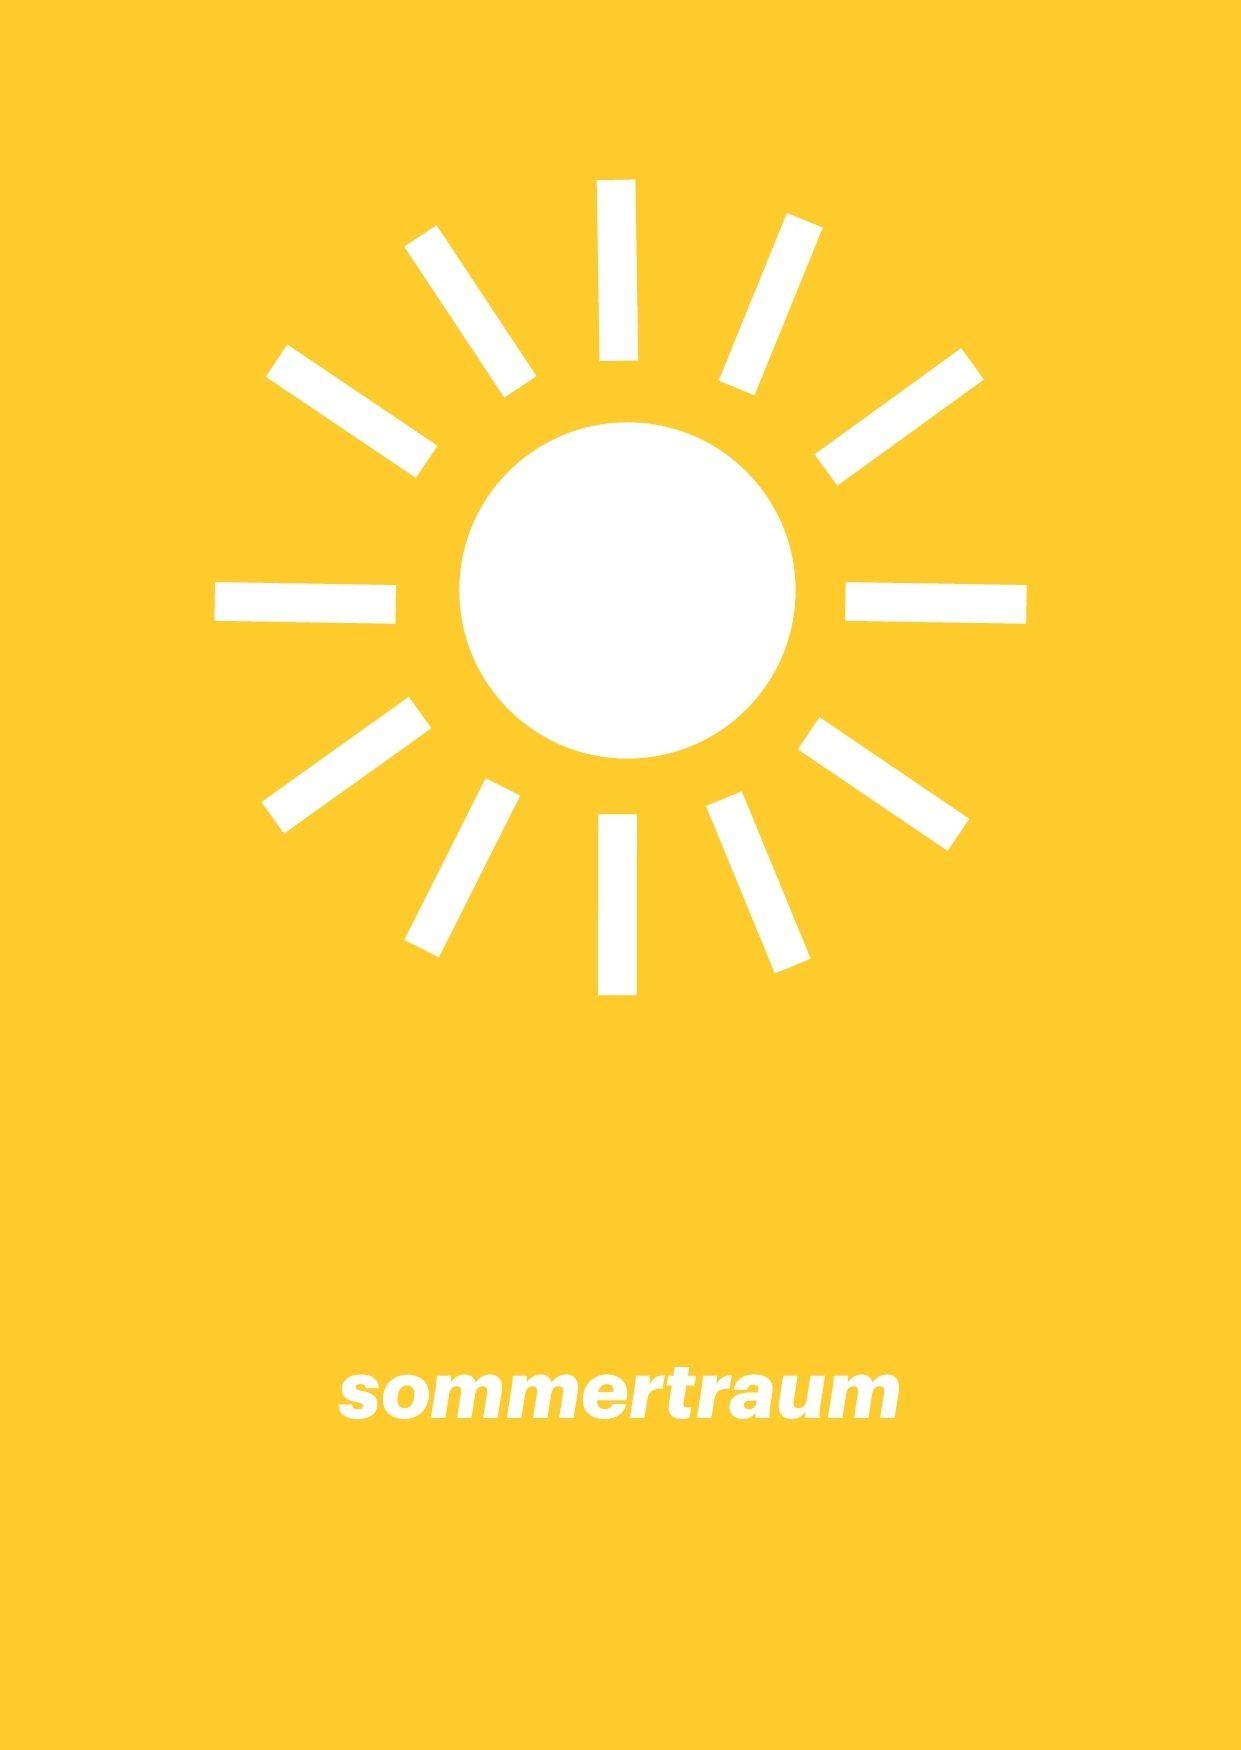 Sommertraum, 18-35 J.